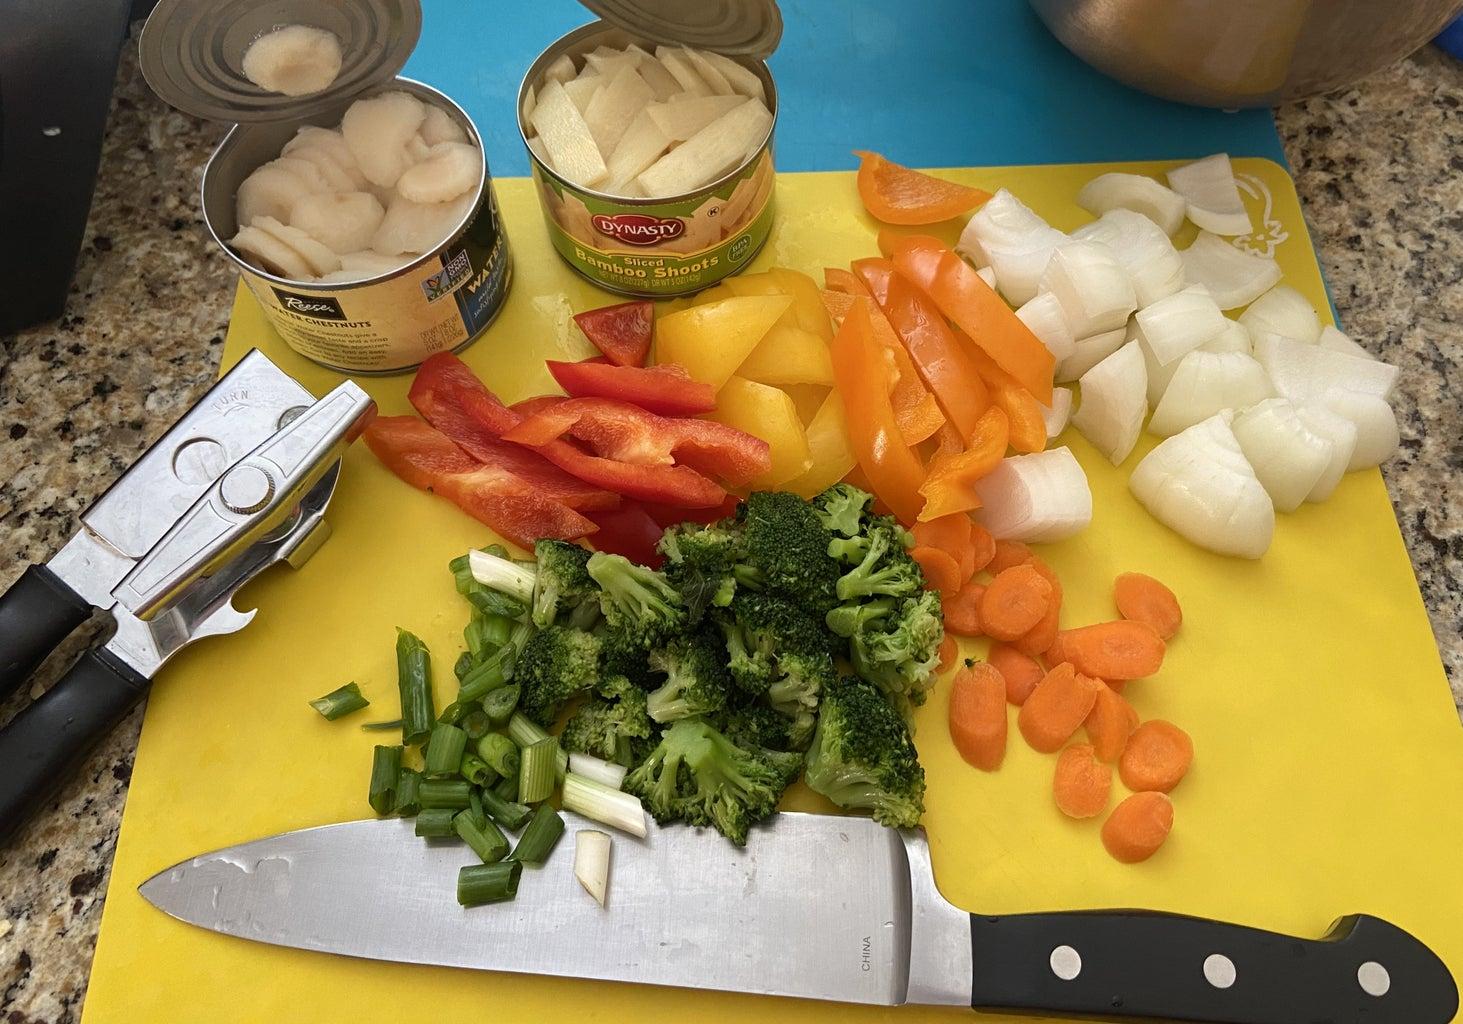 Mushrooms and Vegetable Prep